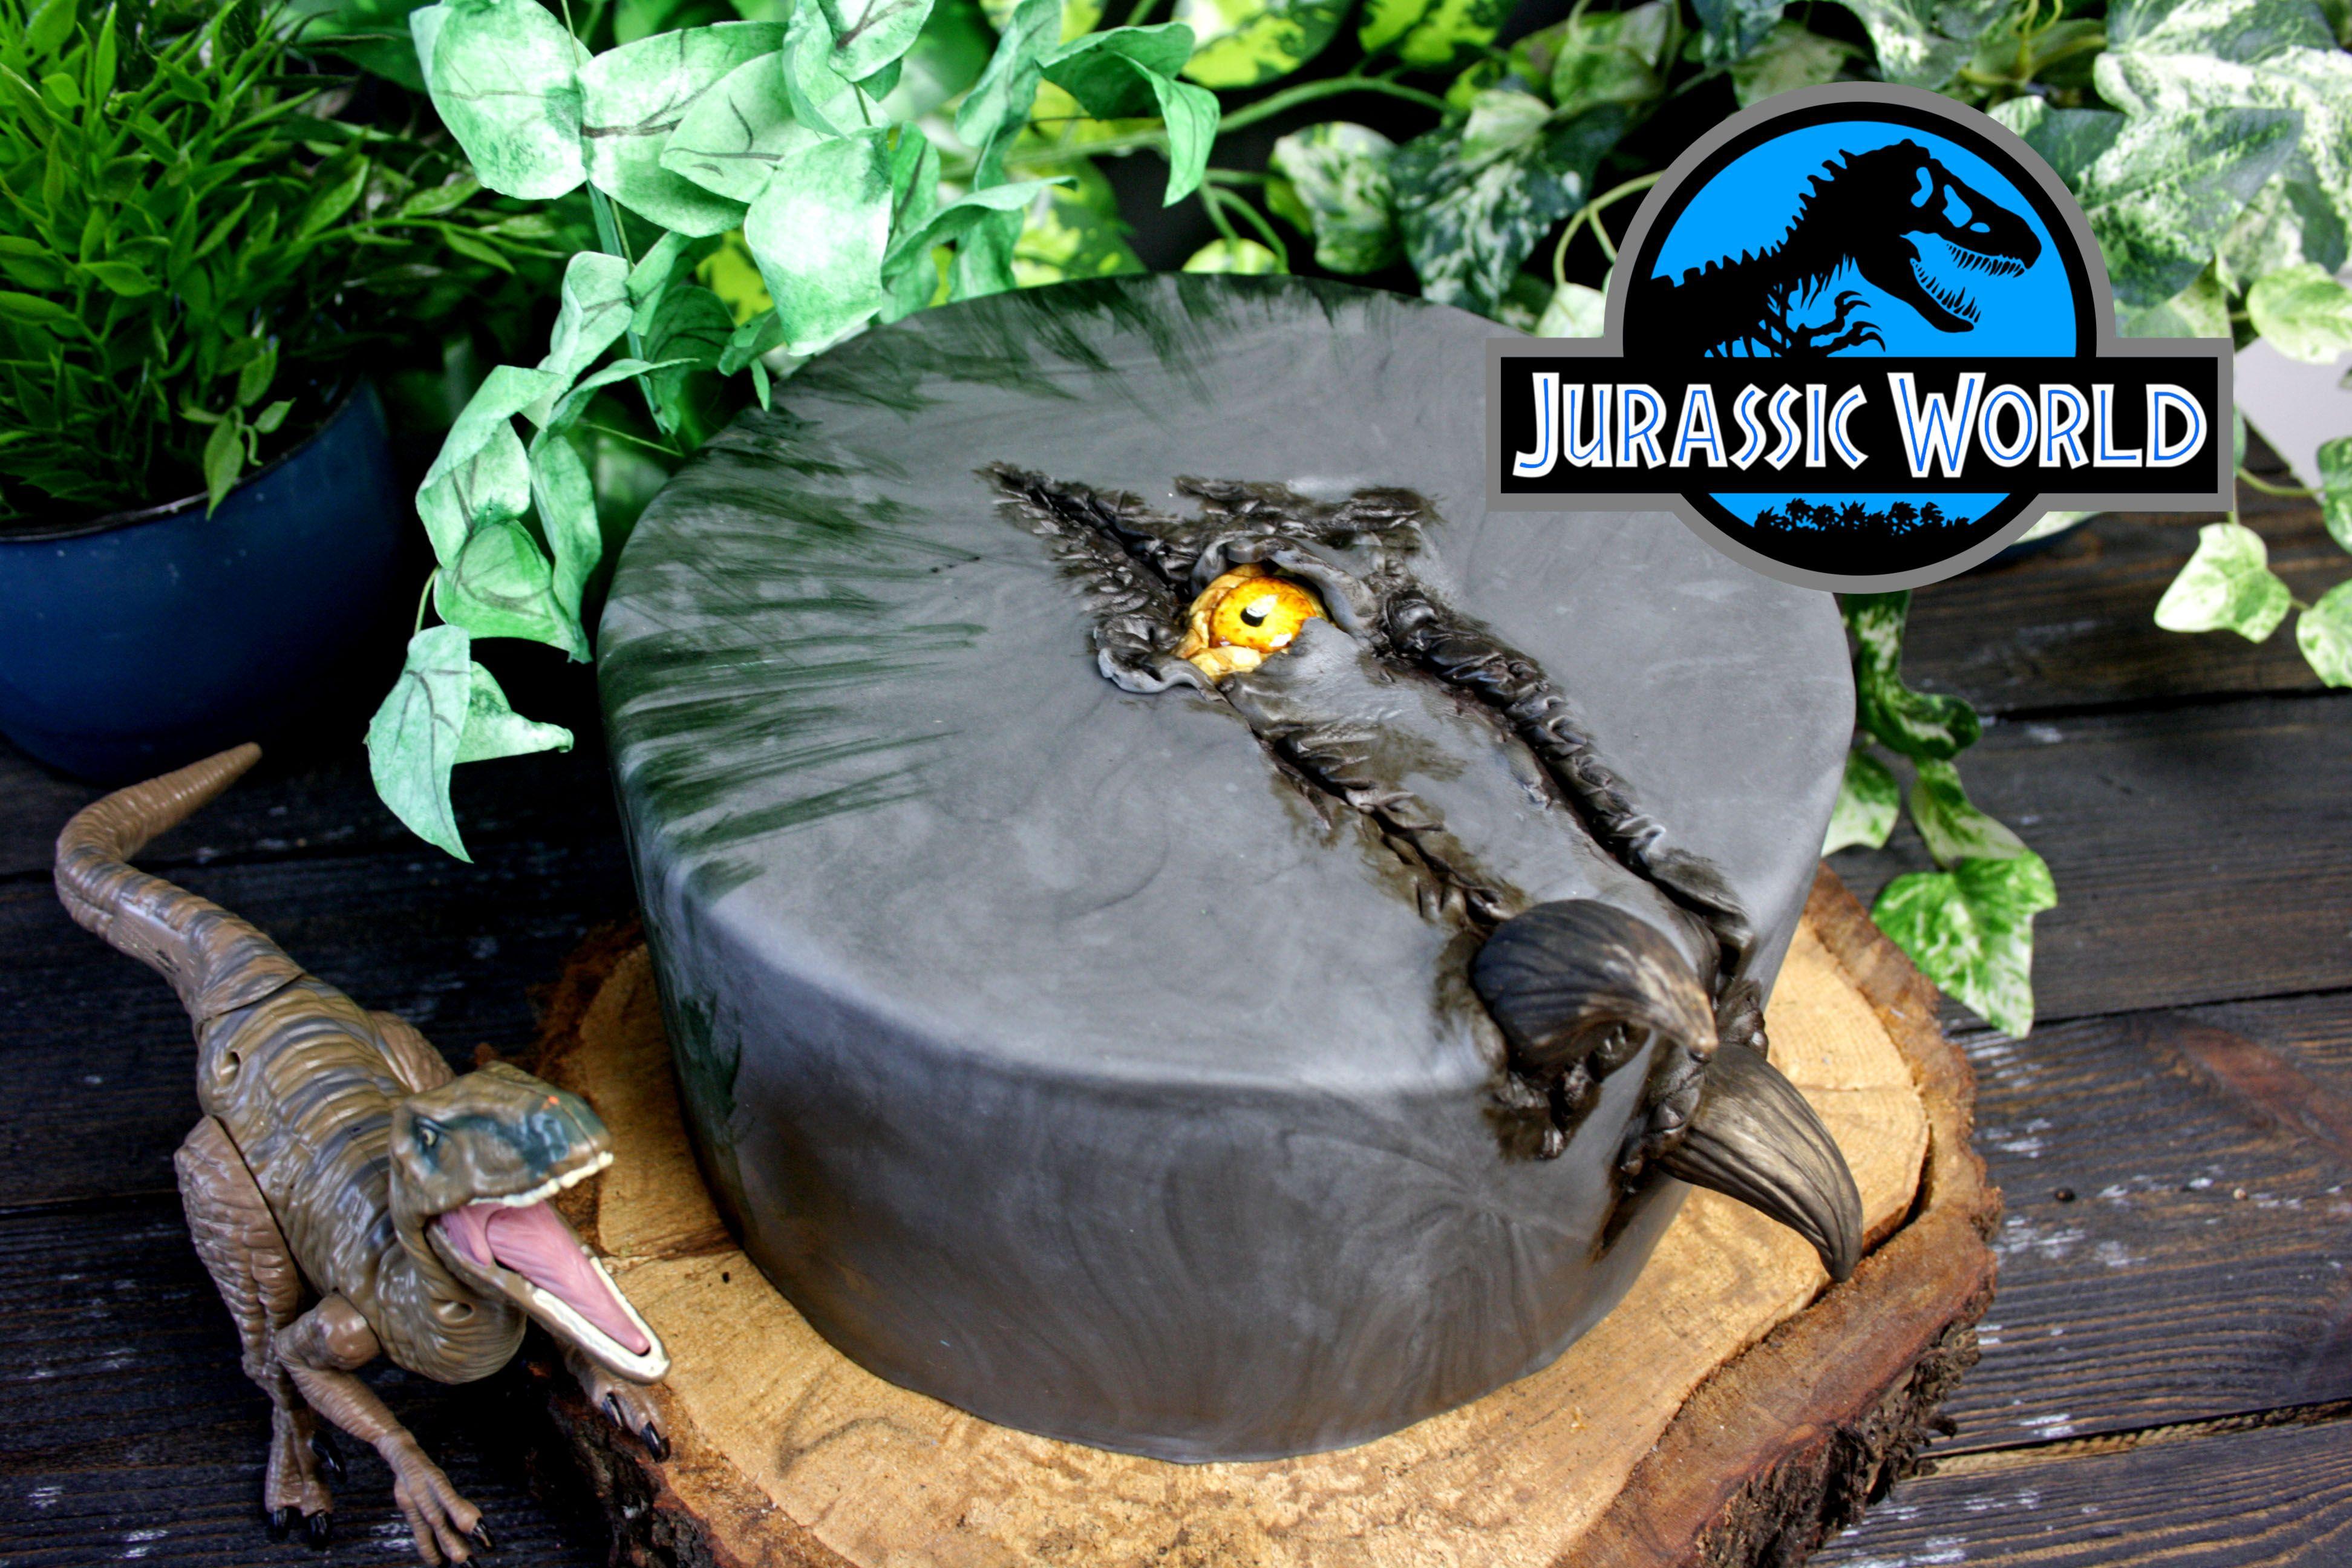 Tort Jurassic World Upadle Krolestwo Jurassic World Fallen